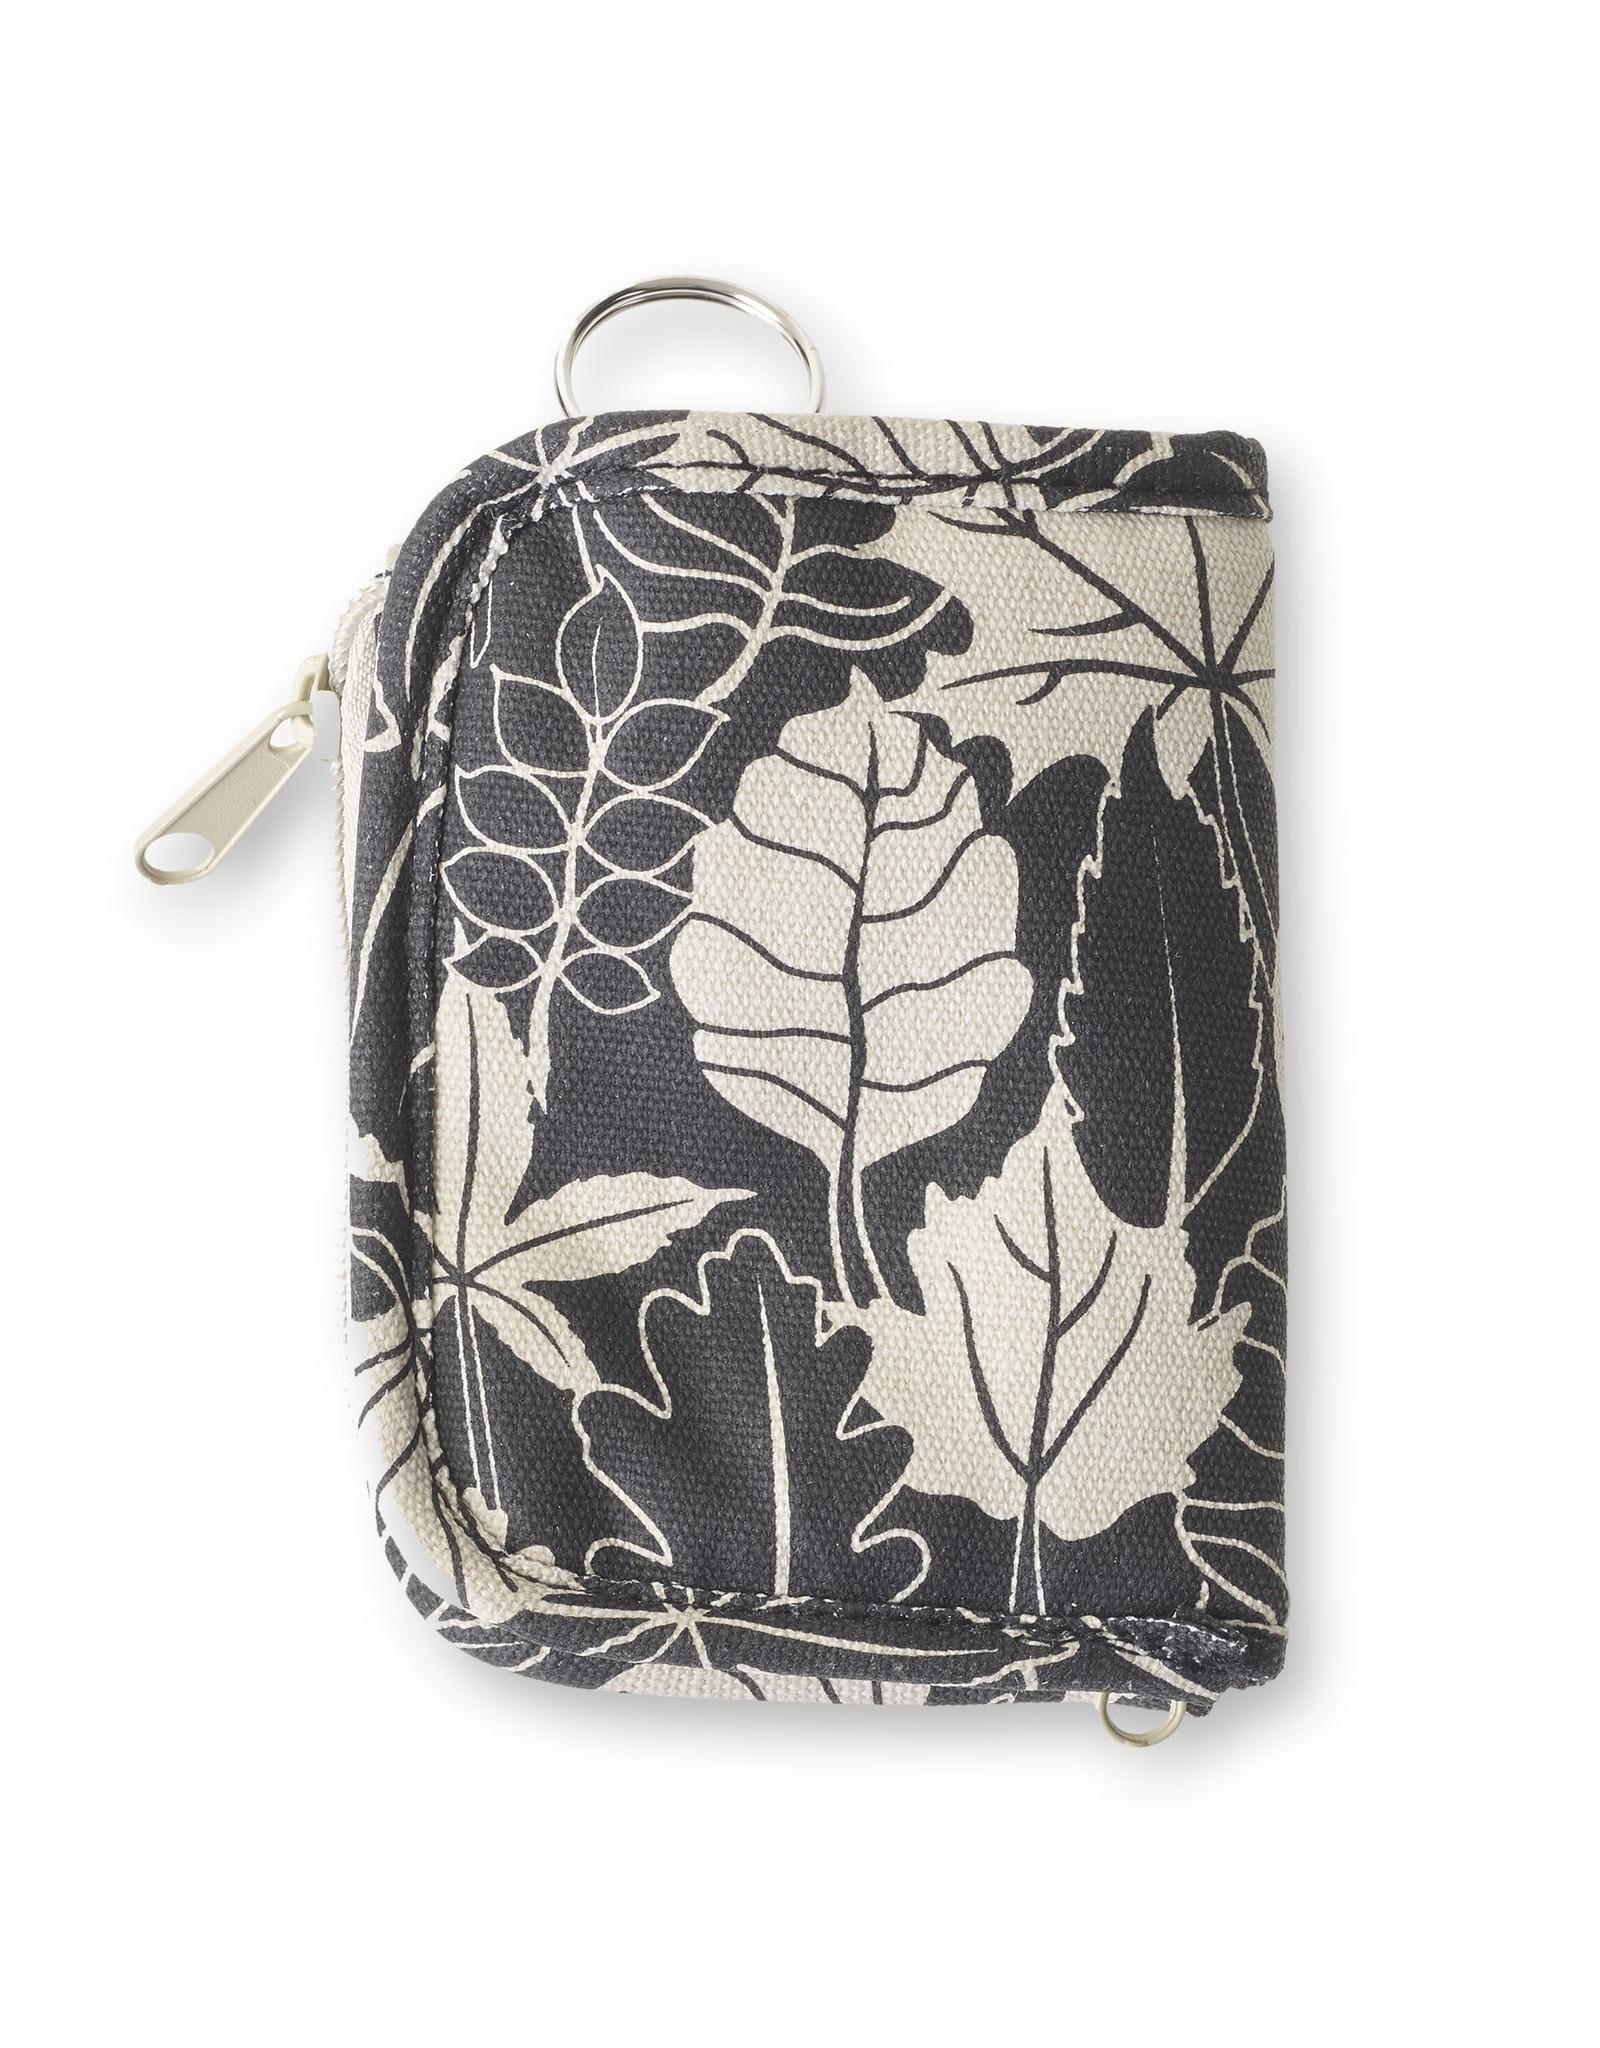 Kavu Zippy Wallet - BW Leaf